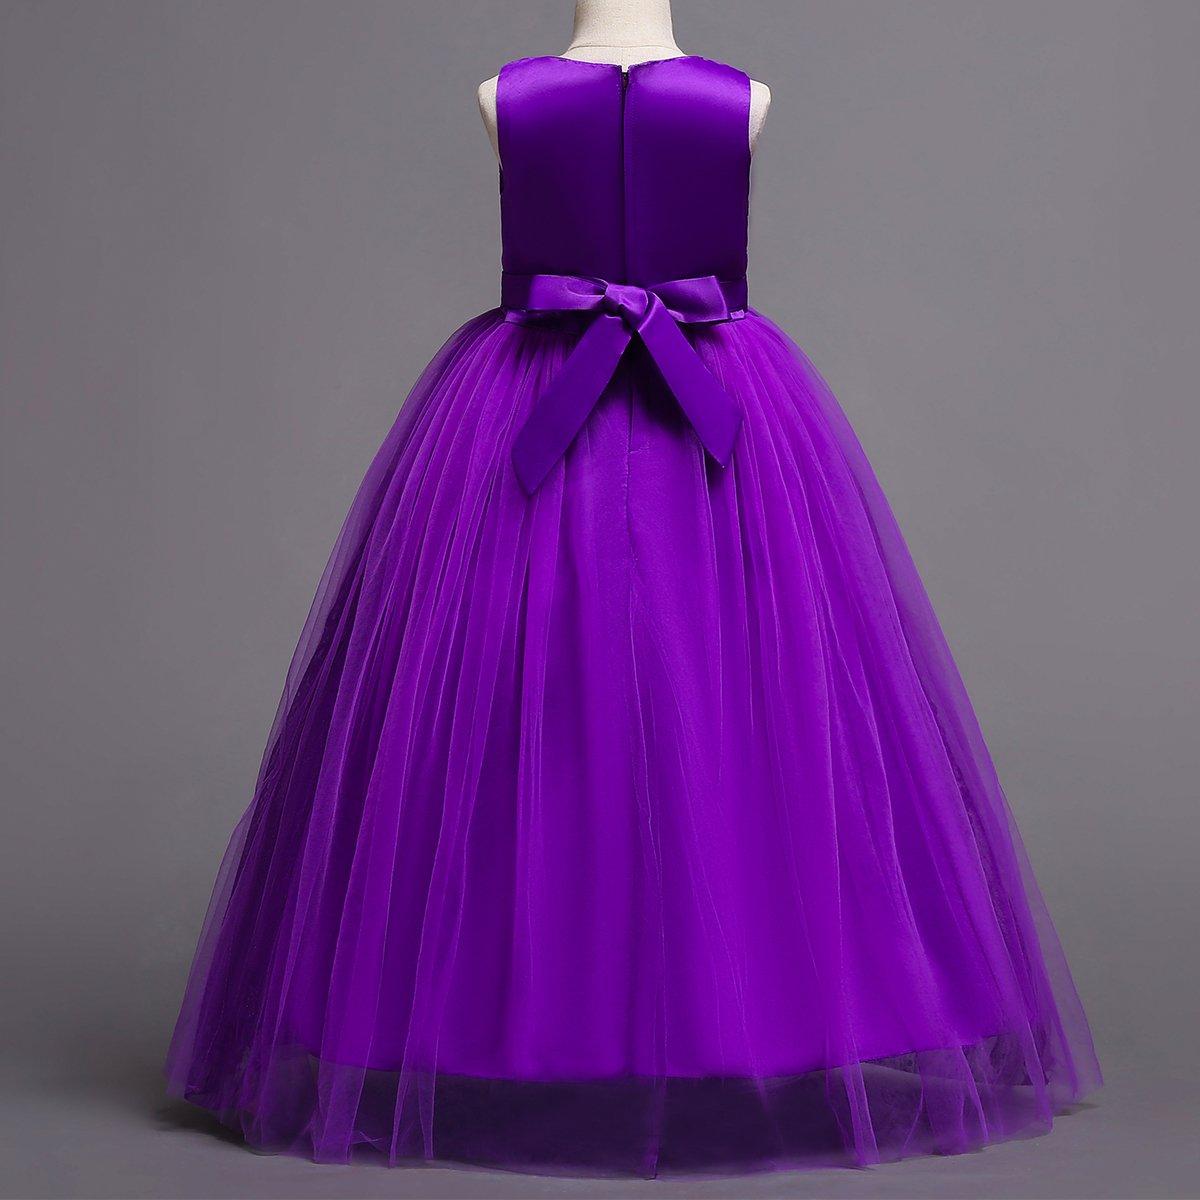 OBEEII Flower Girl Kid Lace Tutu Dress Princess Pageant Wedding Bridesmaid Communion